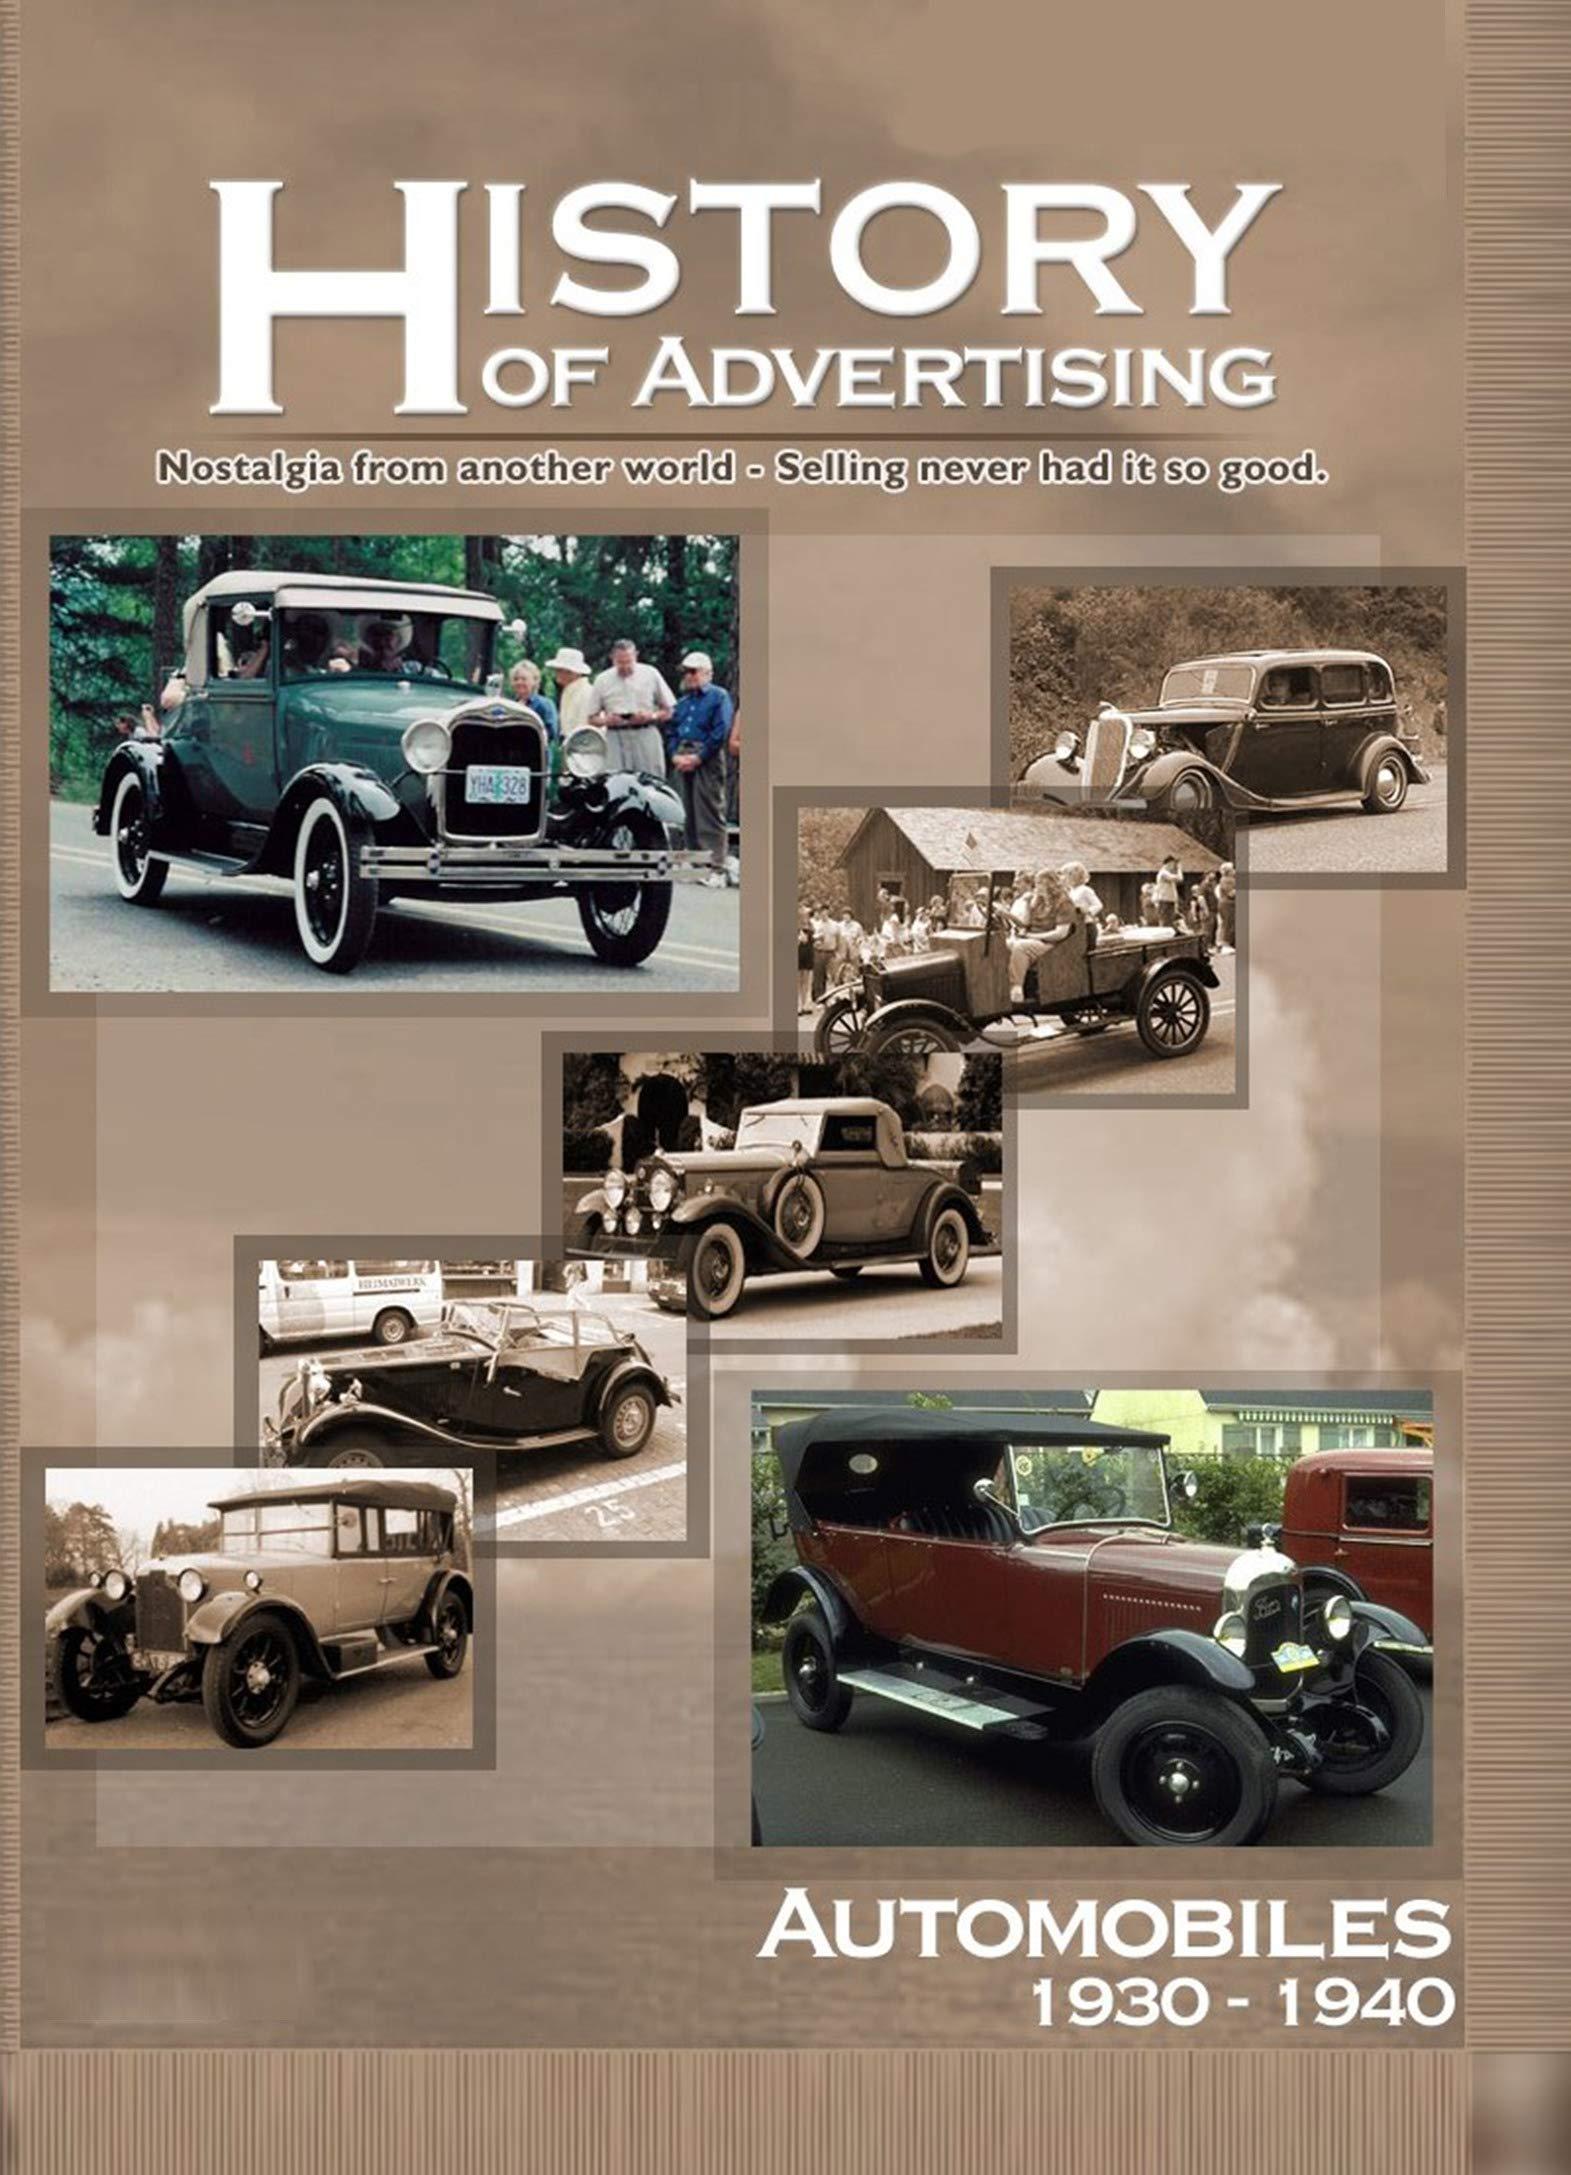 History of Advertising - Automobiles (1930-1940) on Amazon Prime Video UK